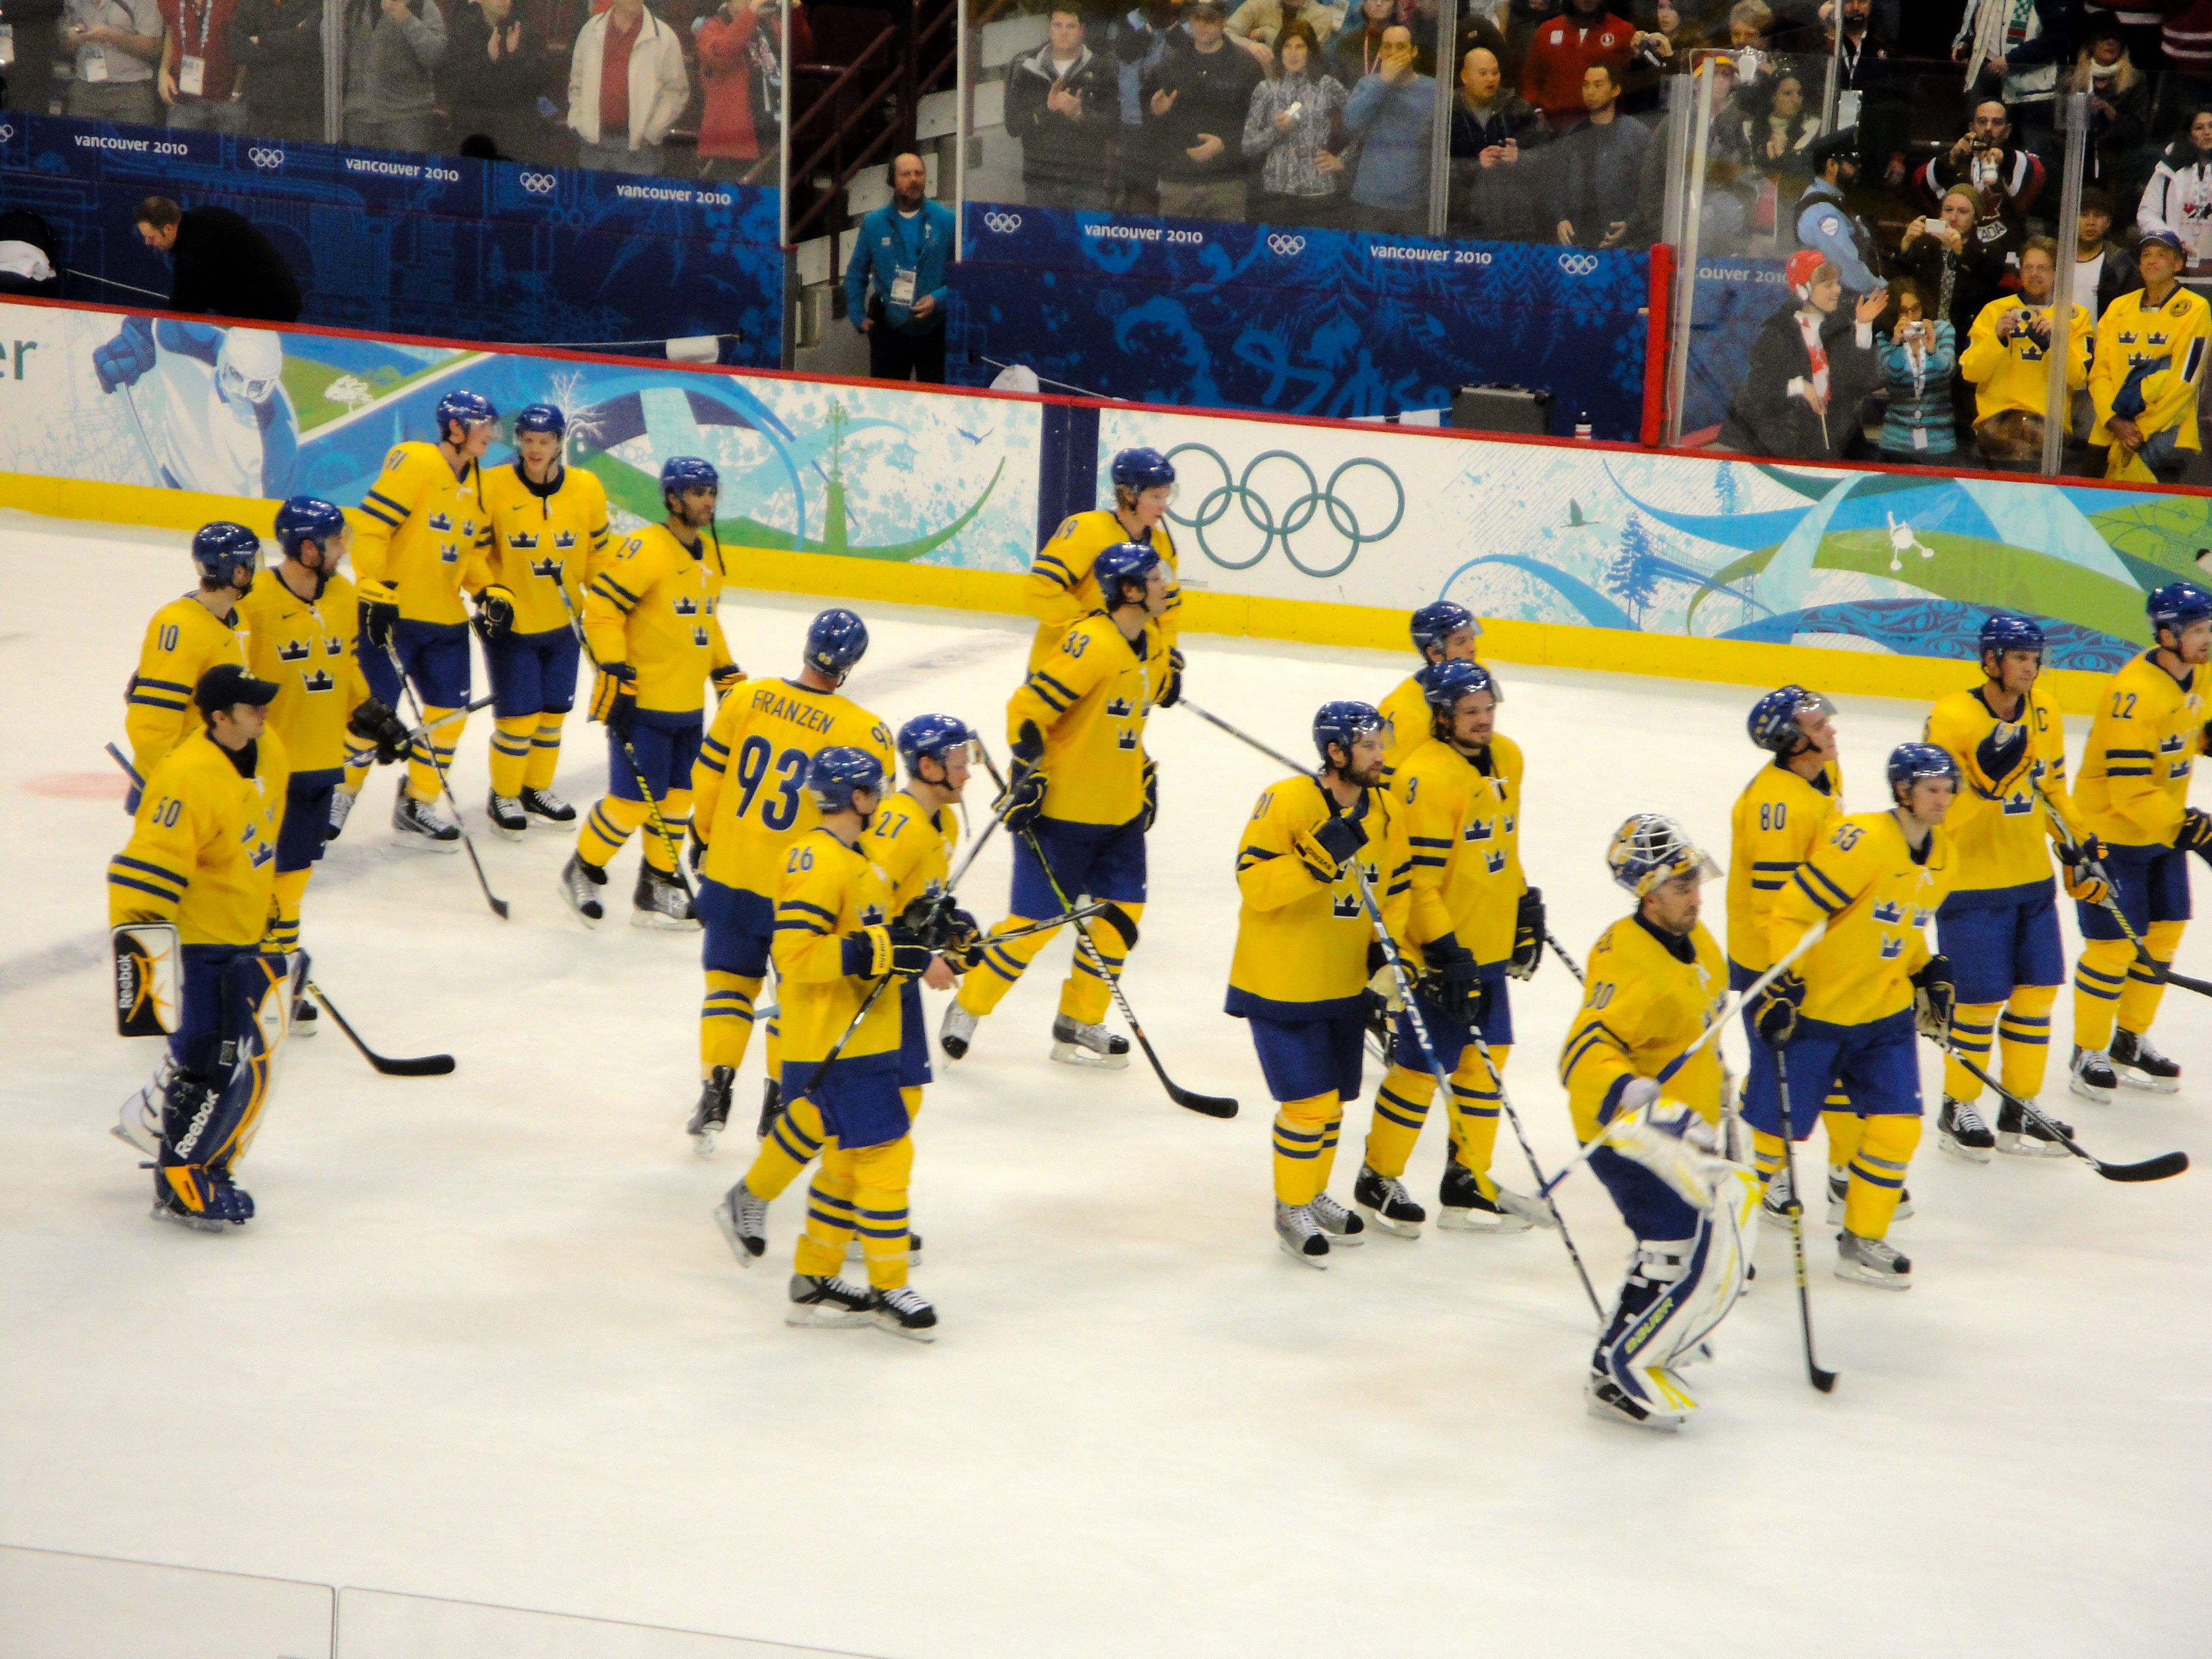 Vancouver Winter Olympics: Swedish hockey team | Mike's Blog